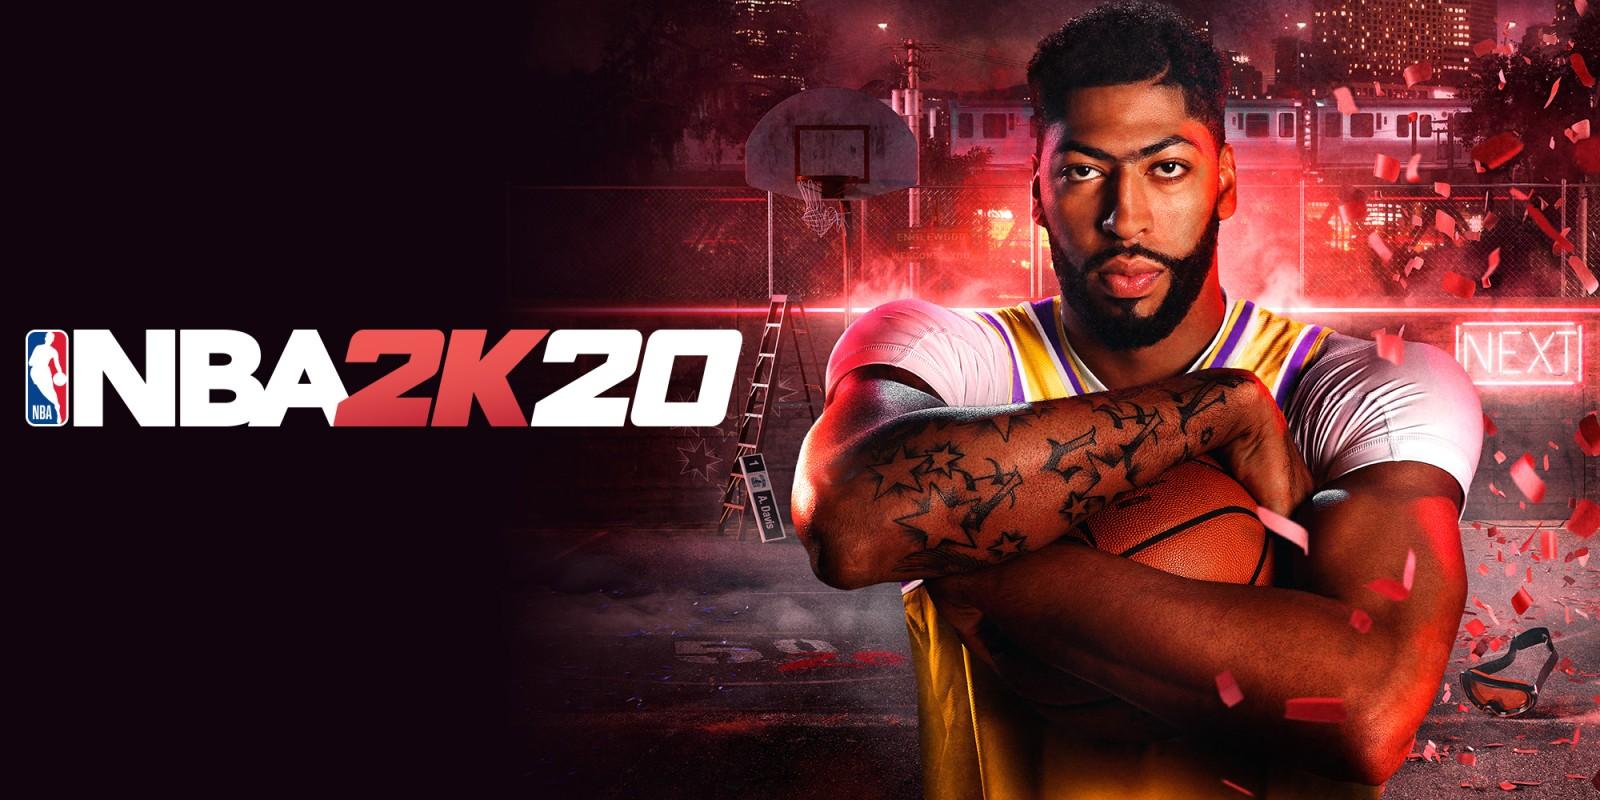 NBA 2K20 Perbarui Versi 1.02 Catatan Patch Penuh (PS4, Xbox One, PC)